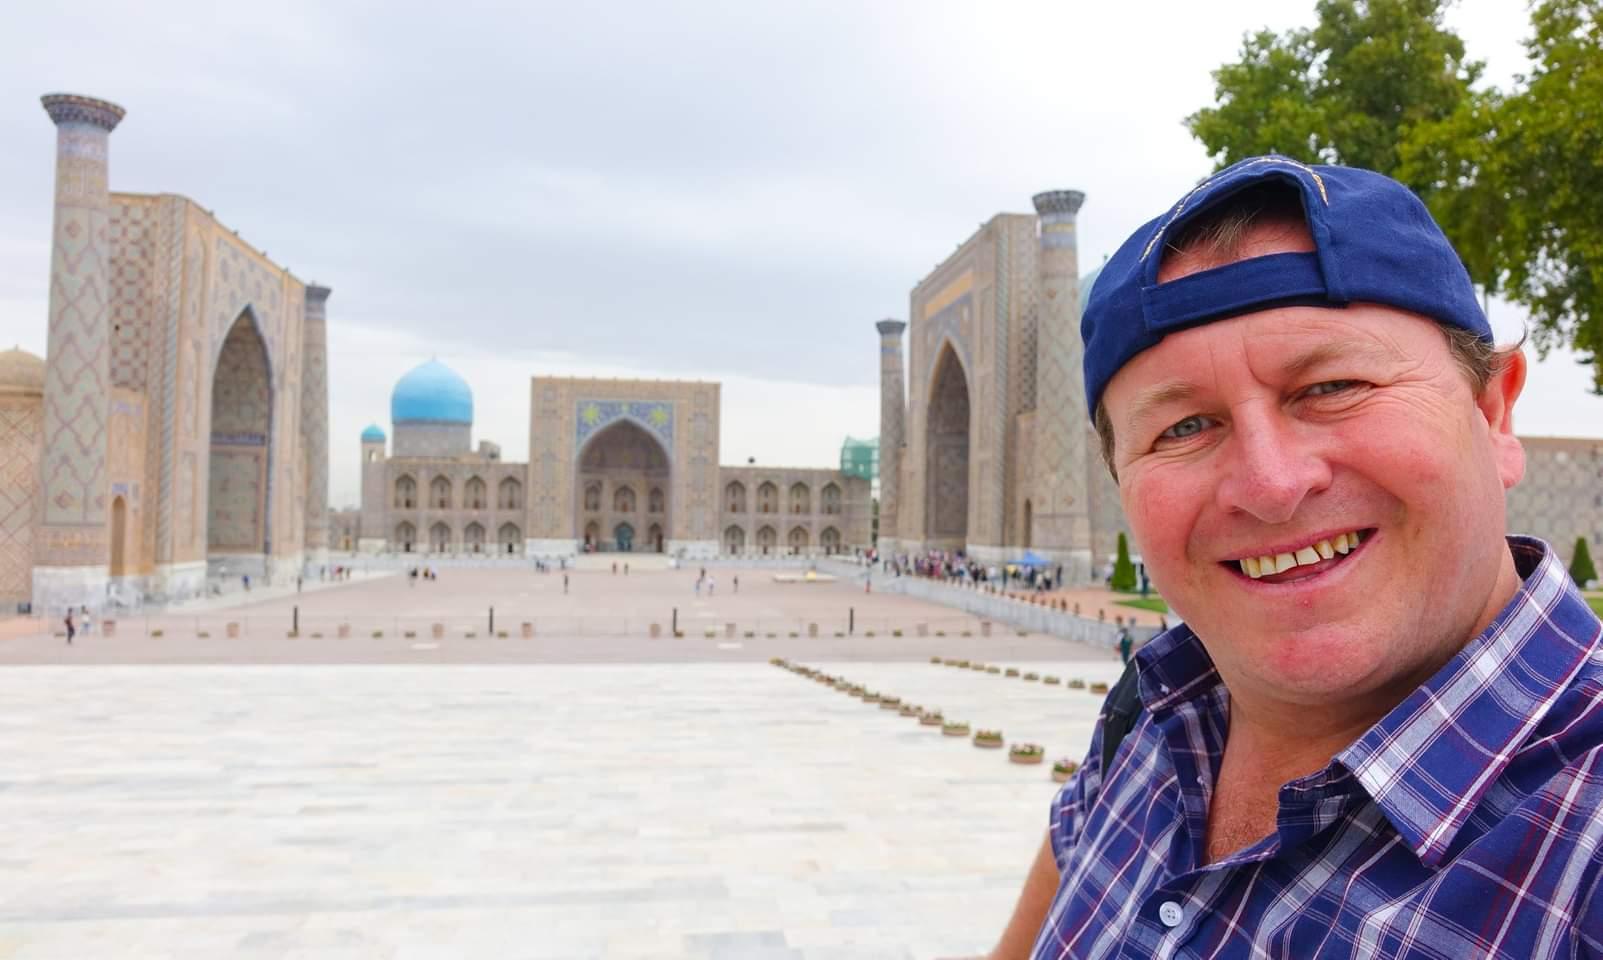 Samarkand, Uzbekistan. The incredible Registan square